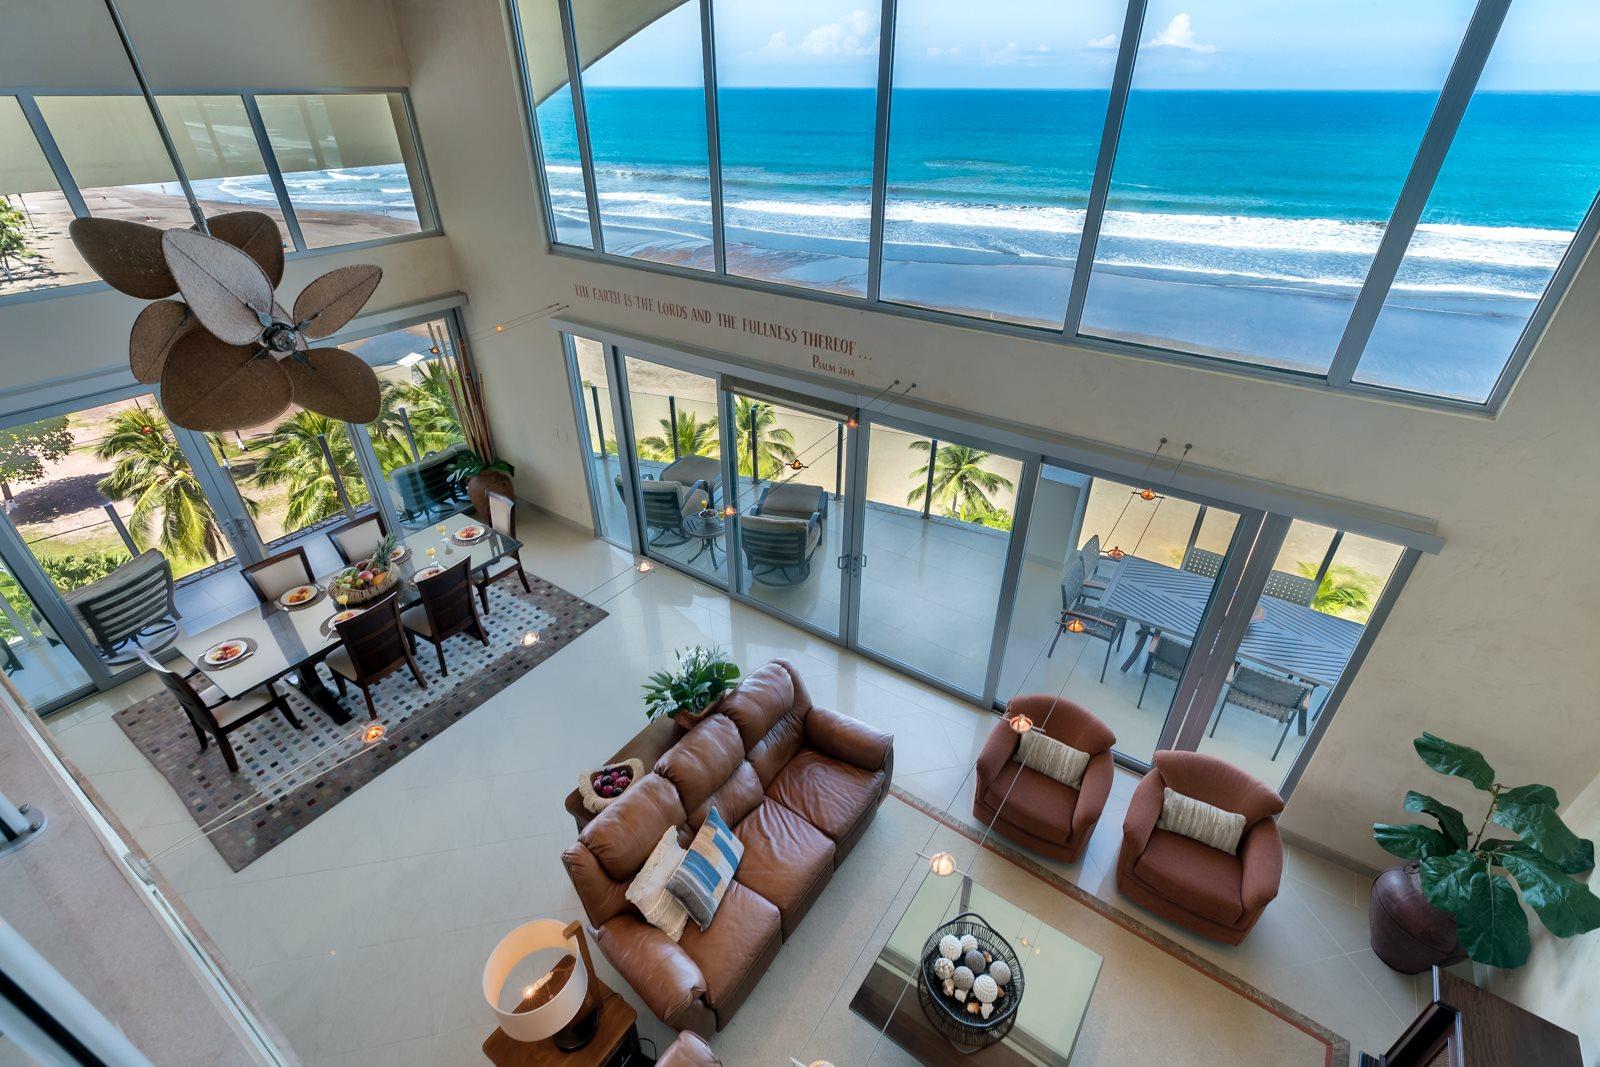 4 Bedroom Luxury Ocean View Penthouse Wrap Around Balconies-FINANCING AVAILABLE